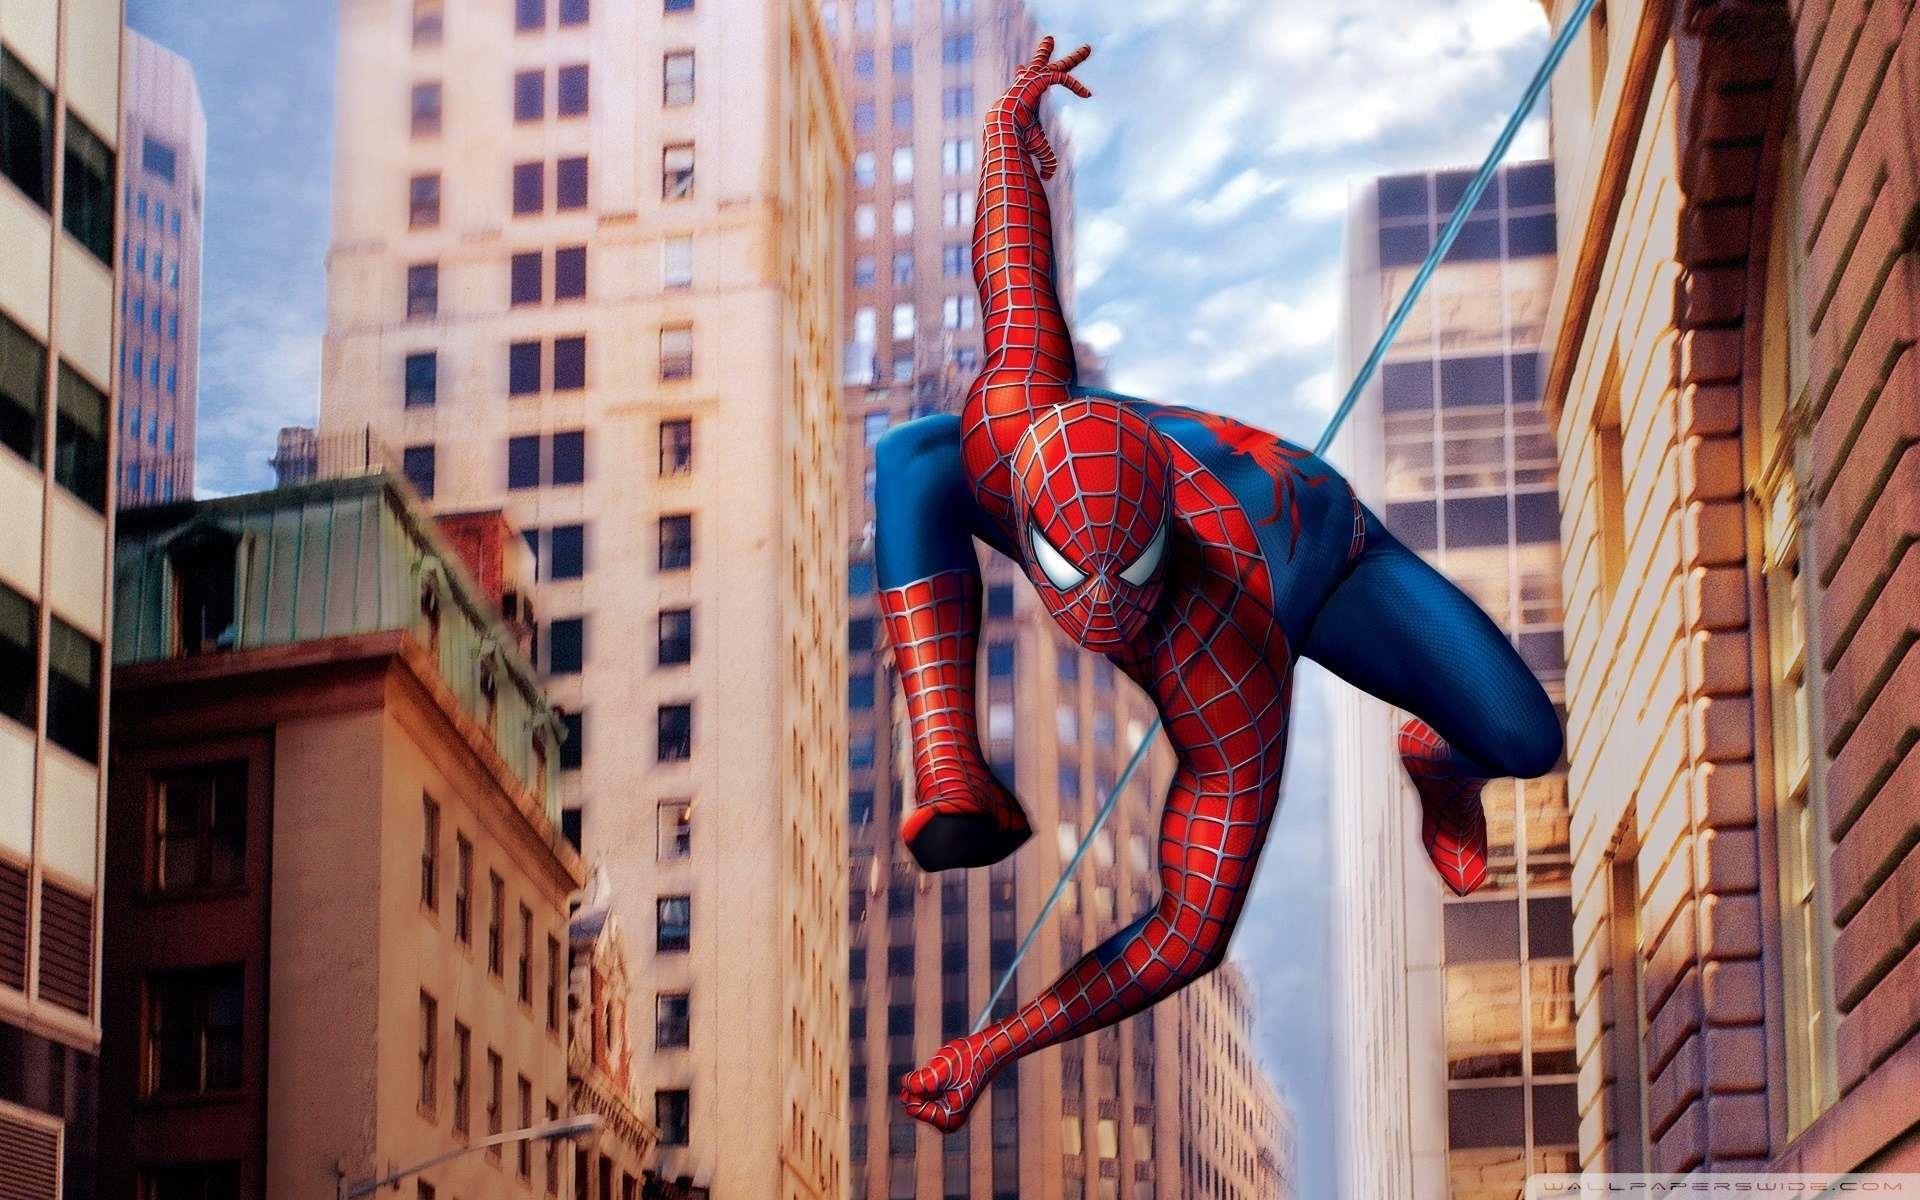 Hd wallpaper upload - Wallpaper Spiderman Marvel Wallpaper 1080p Hd Upload At January 2